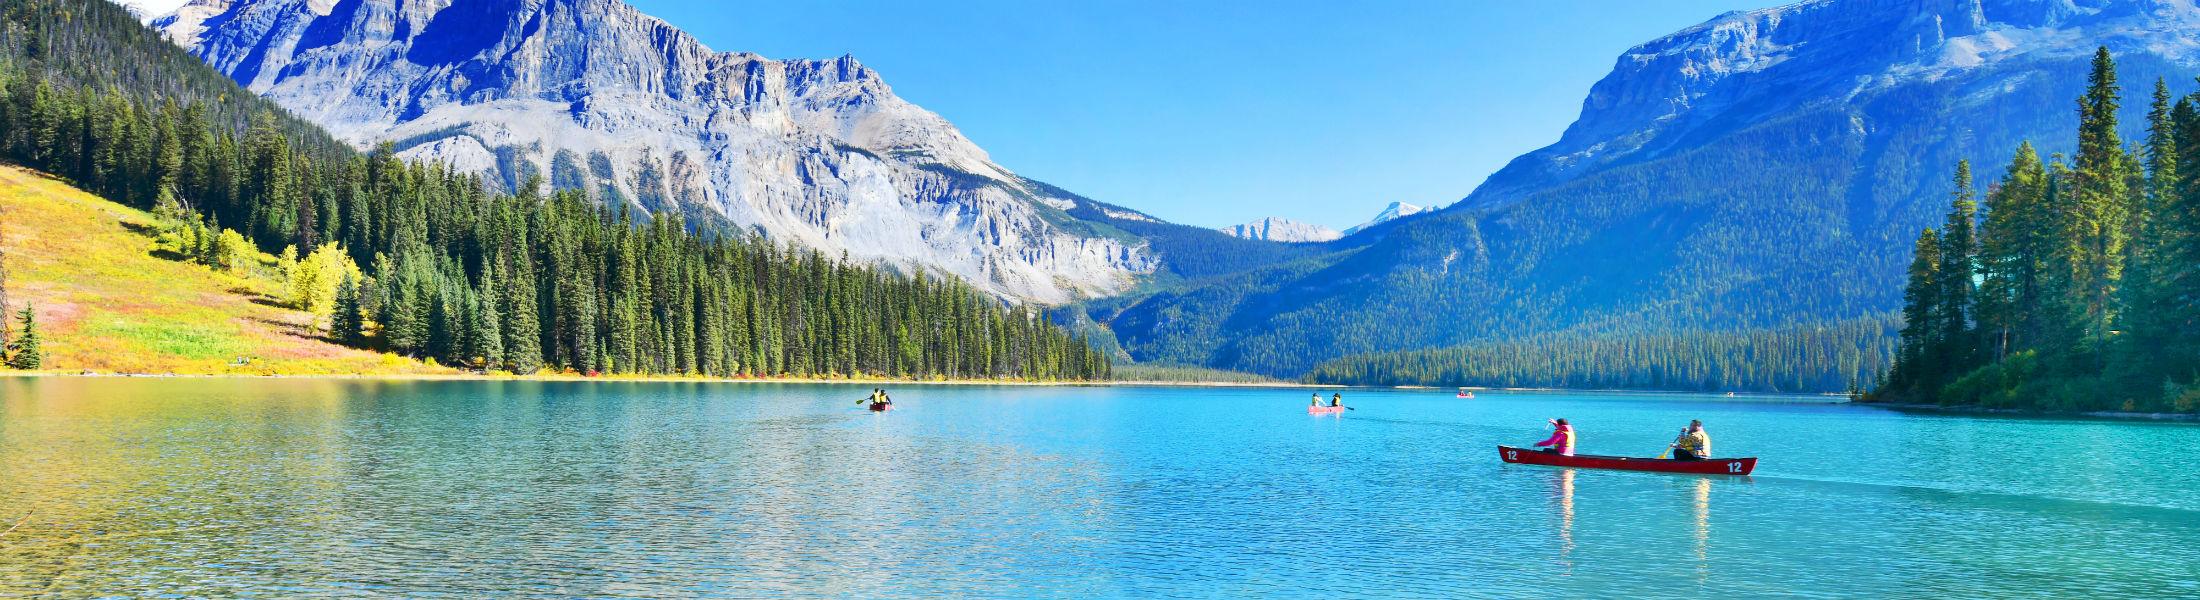 Emerald LakeYoho National Park in Canada